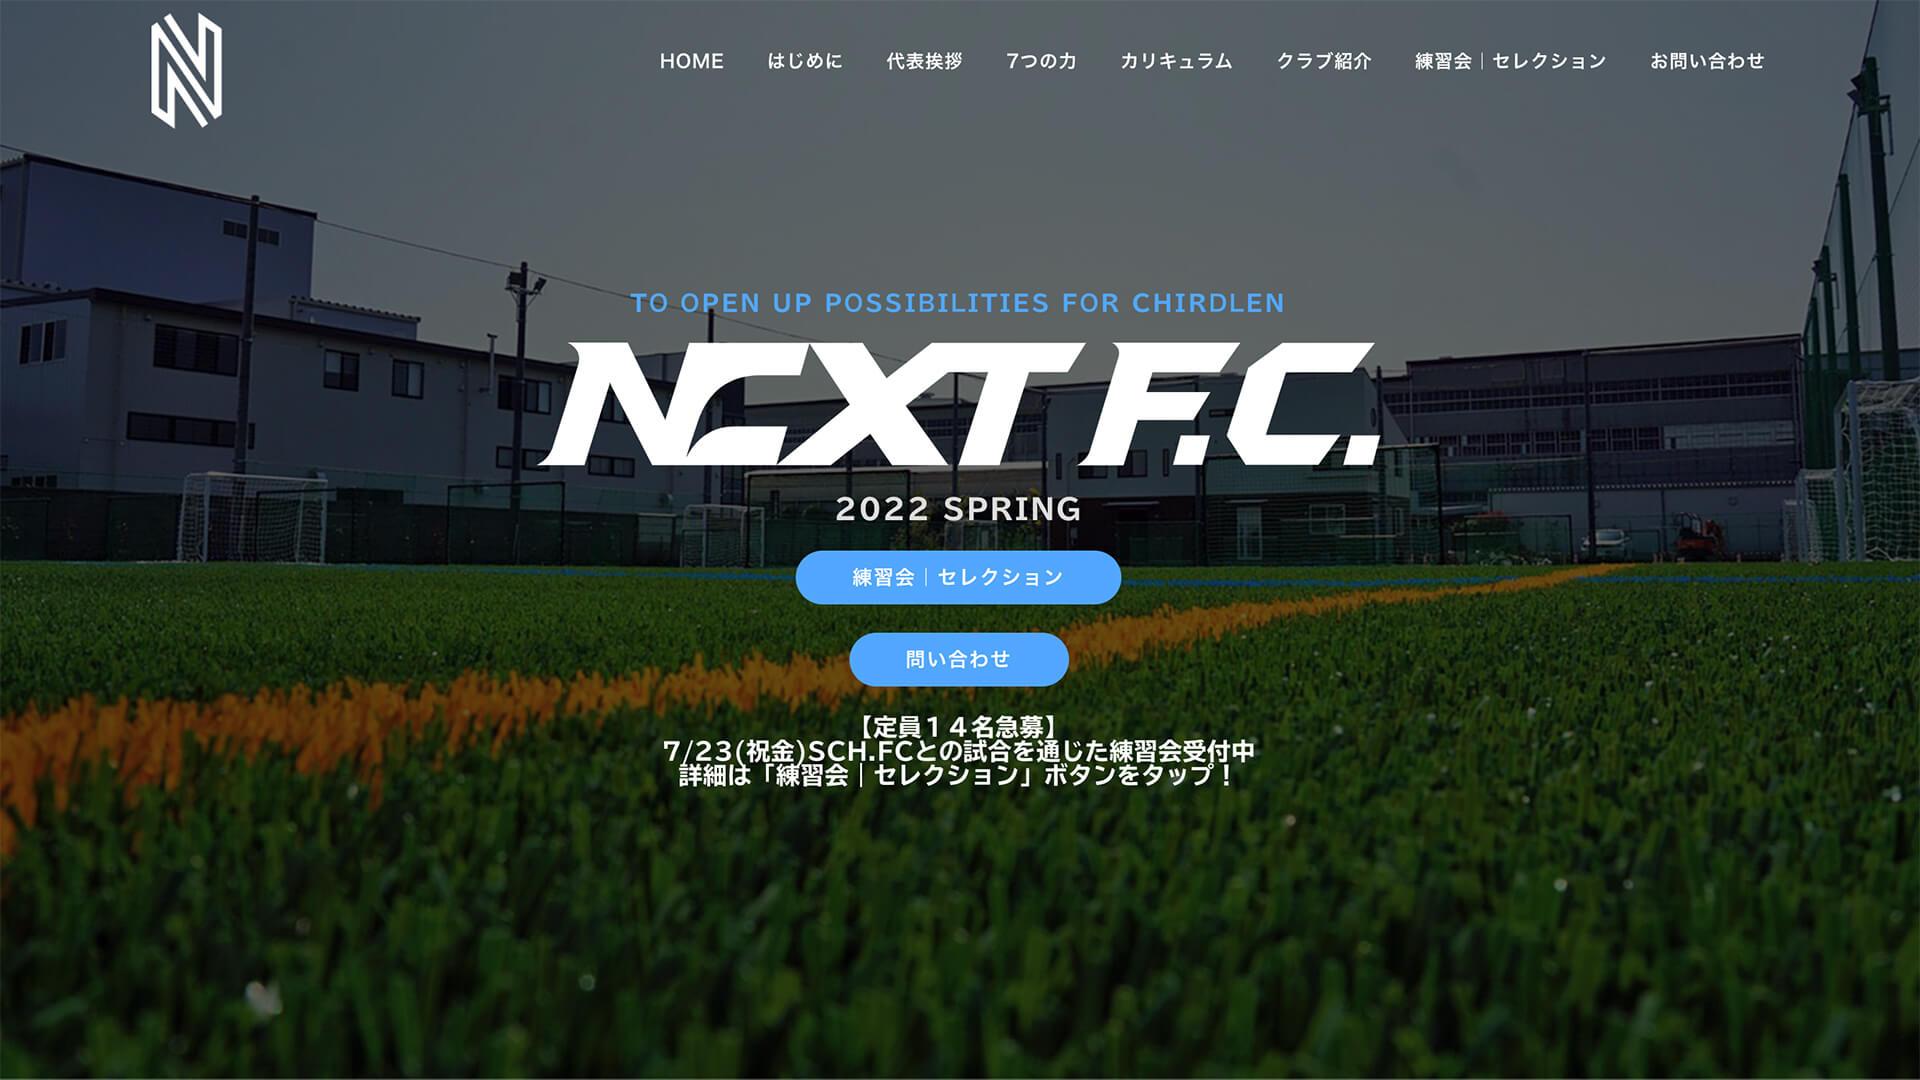 NEXT-F.C.